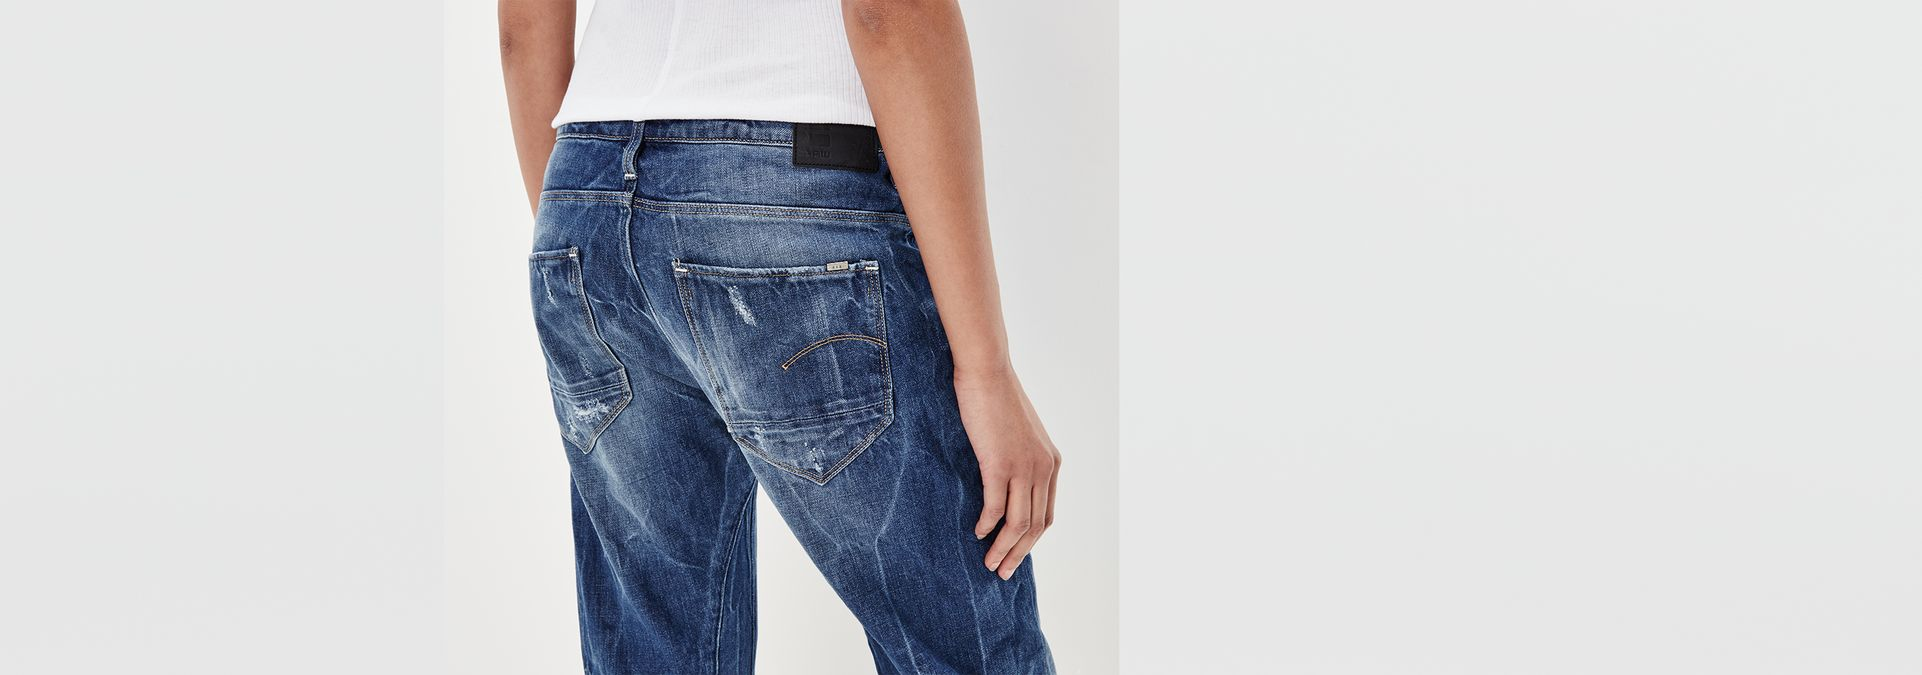 arc 3d low waist boyfriend jeans g star raw. Black Bedroom Furniture Sets. Home Design Ideas